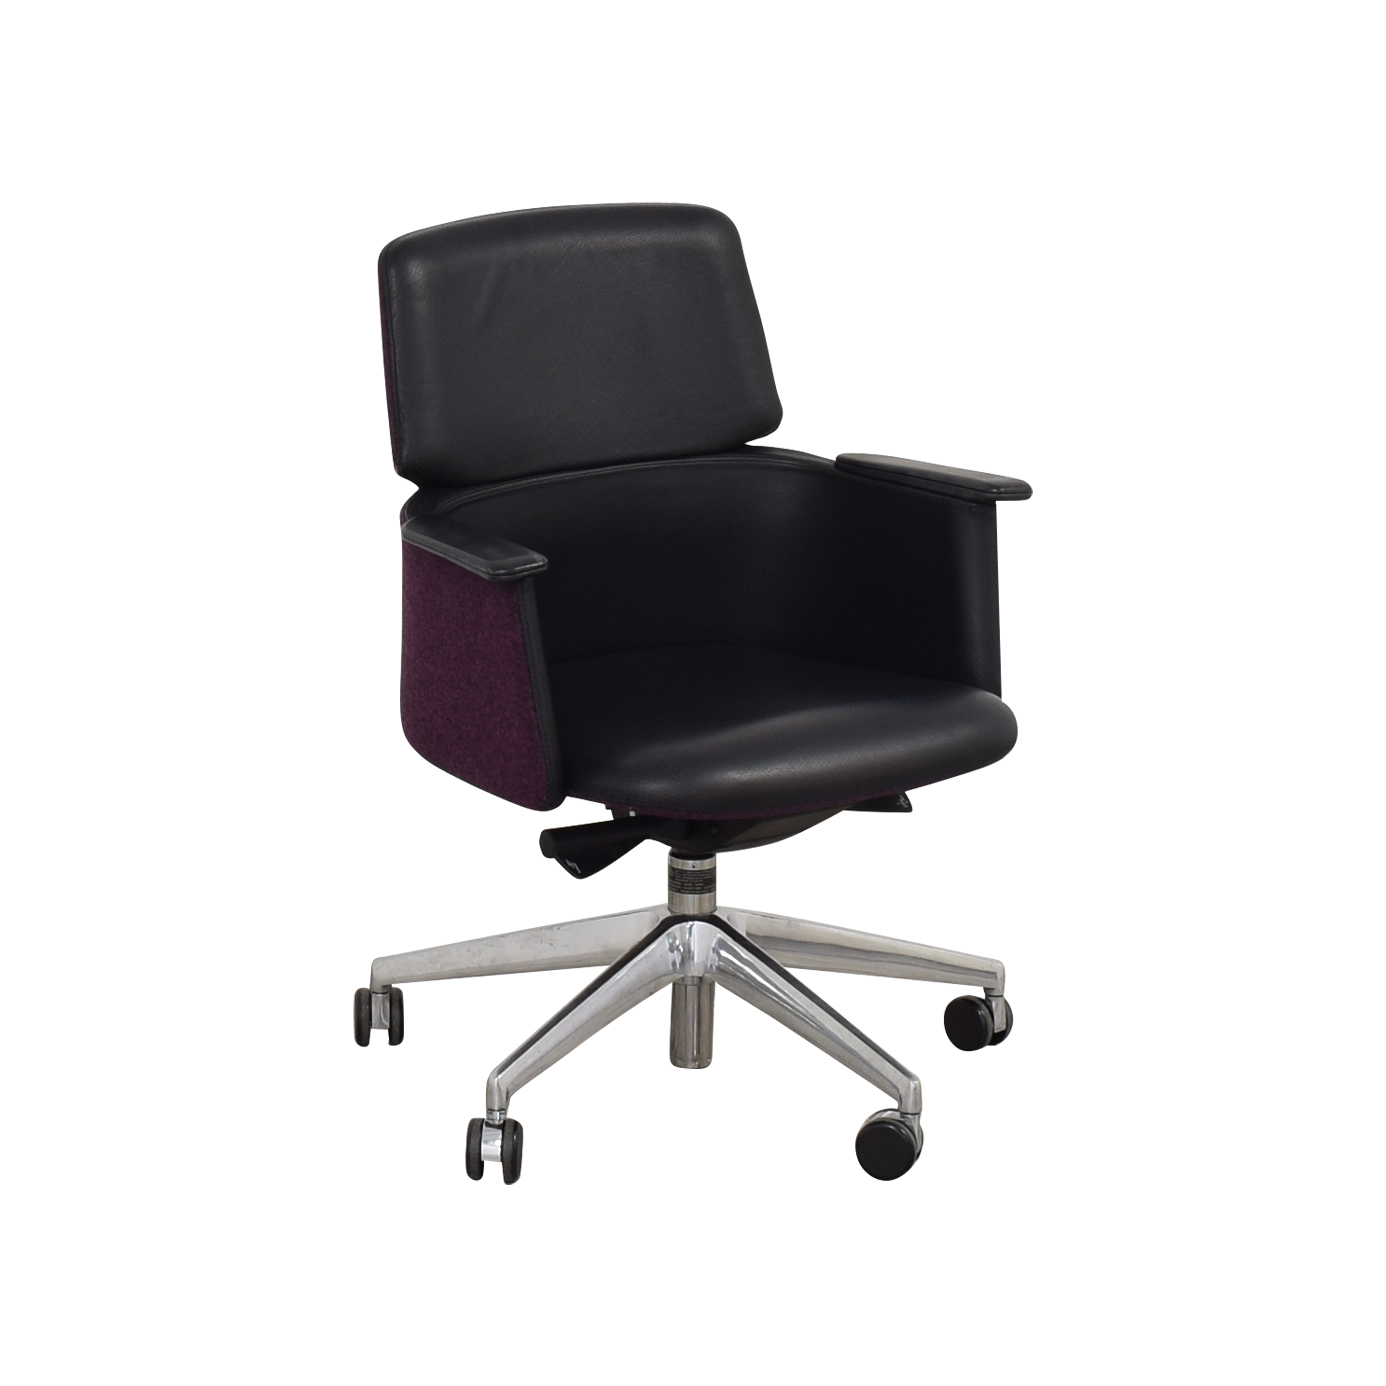 Koleksiyon Koleksiyon Tola Task Chair